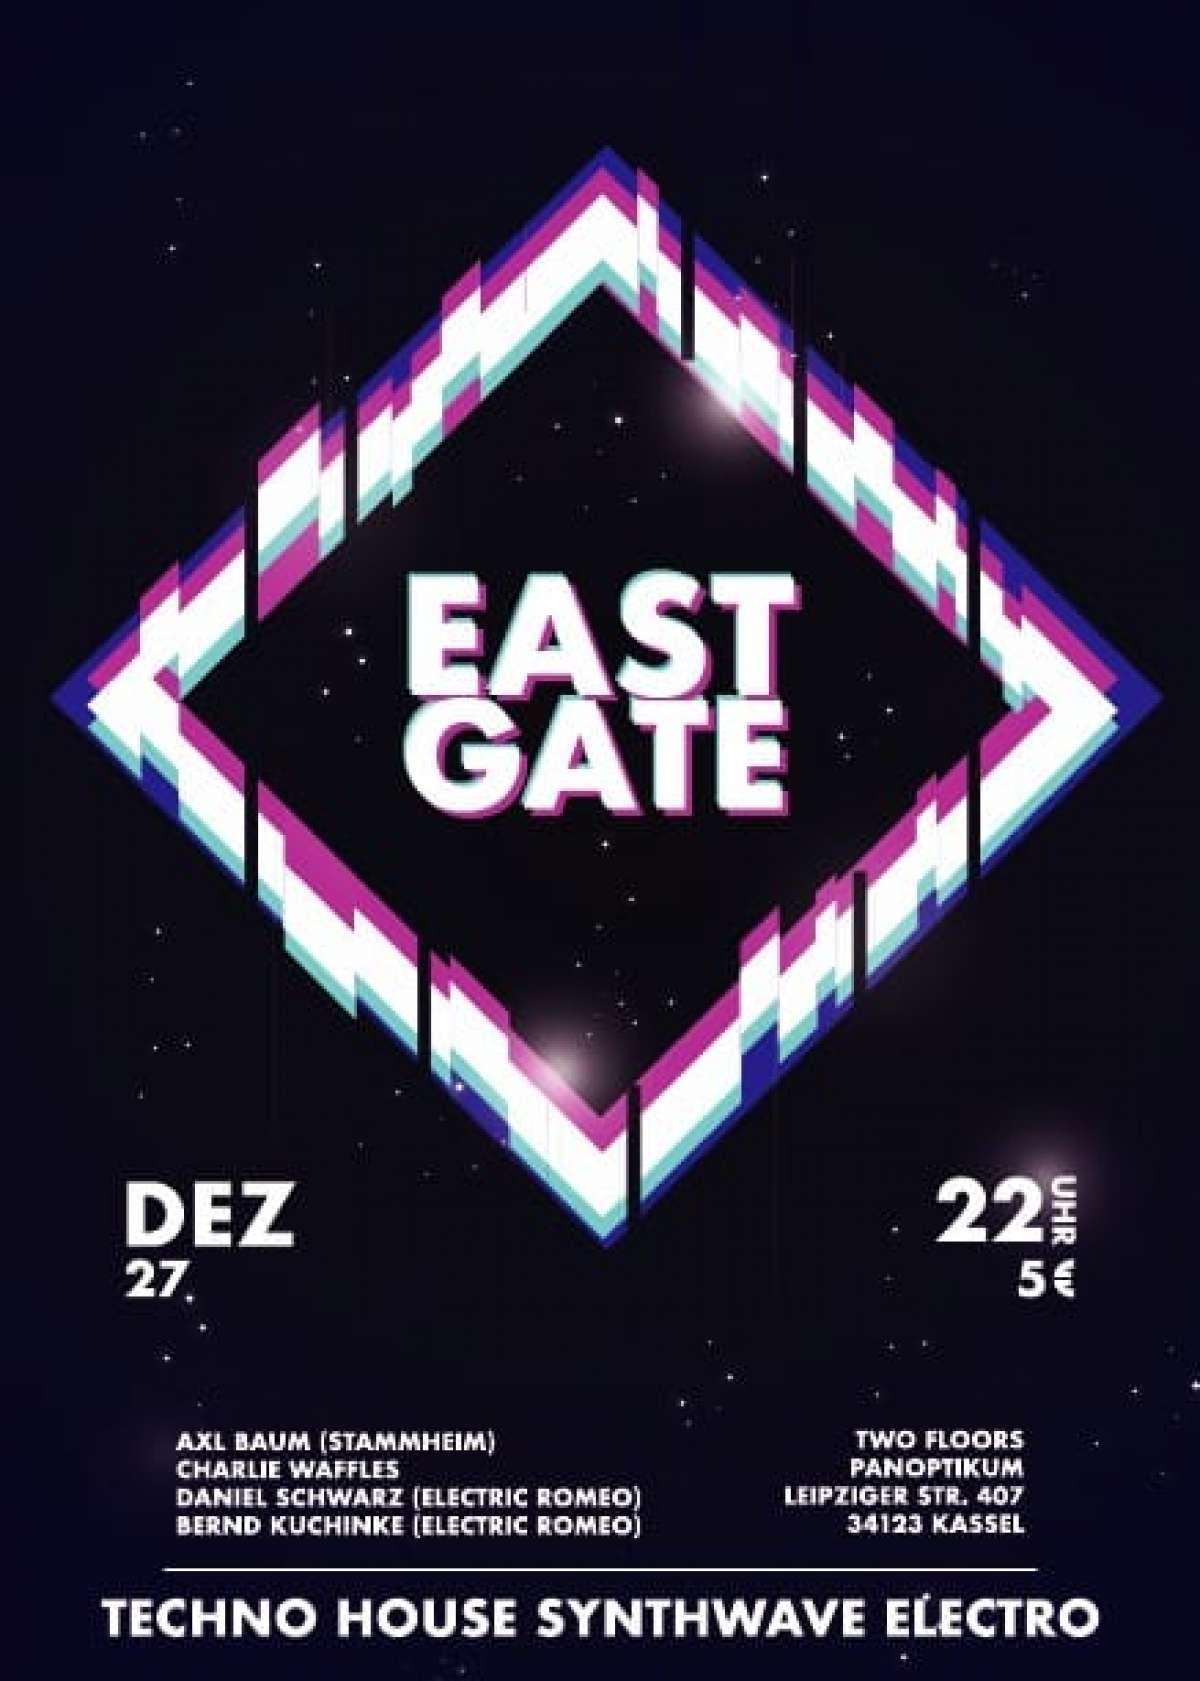 Eastgate - Axl Baum, Charlie Waffles, Daniel Schwarz, Bernd Kuchinke - Panoptikum Club - Kassel